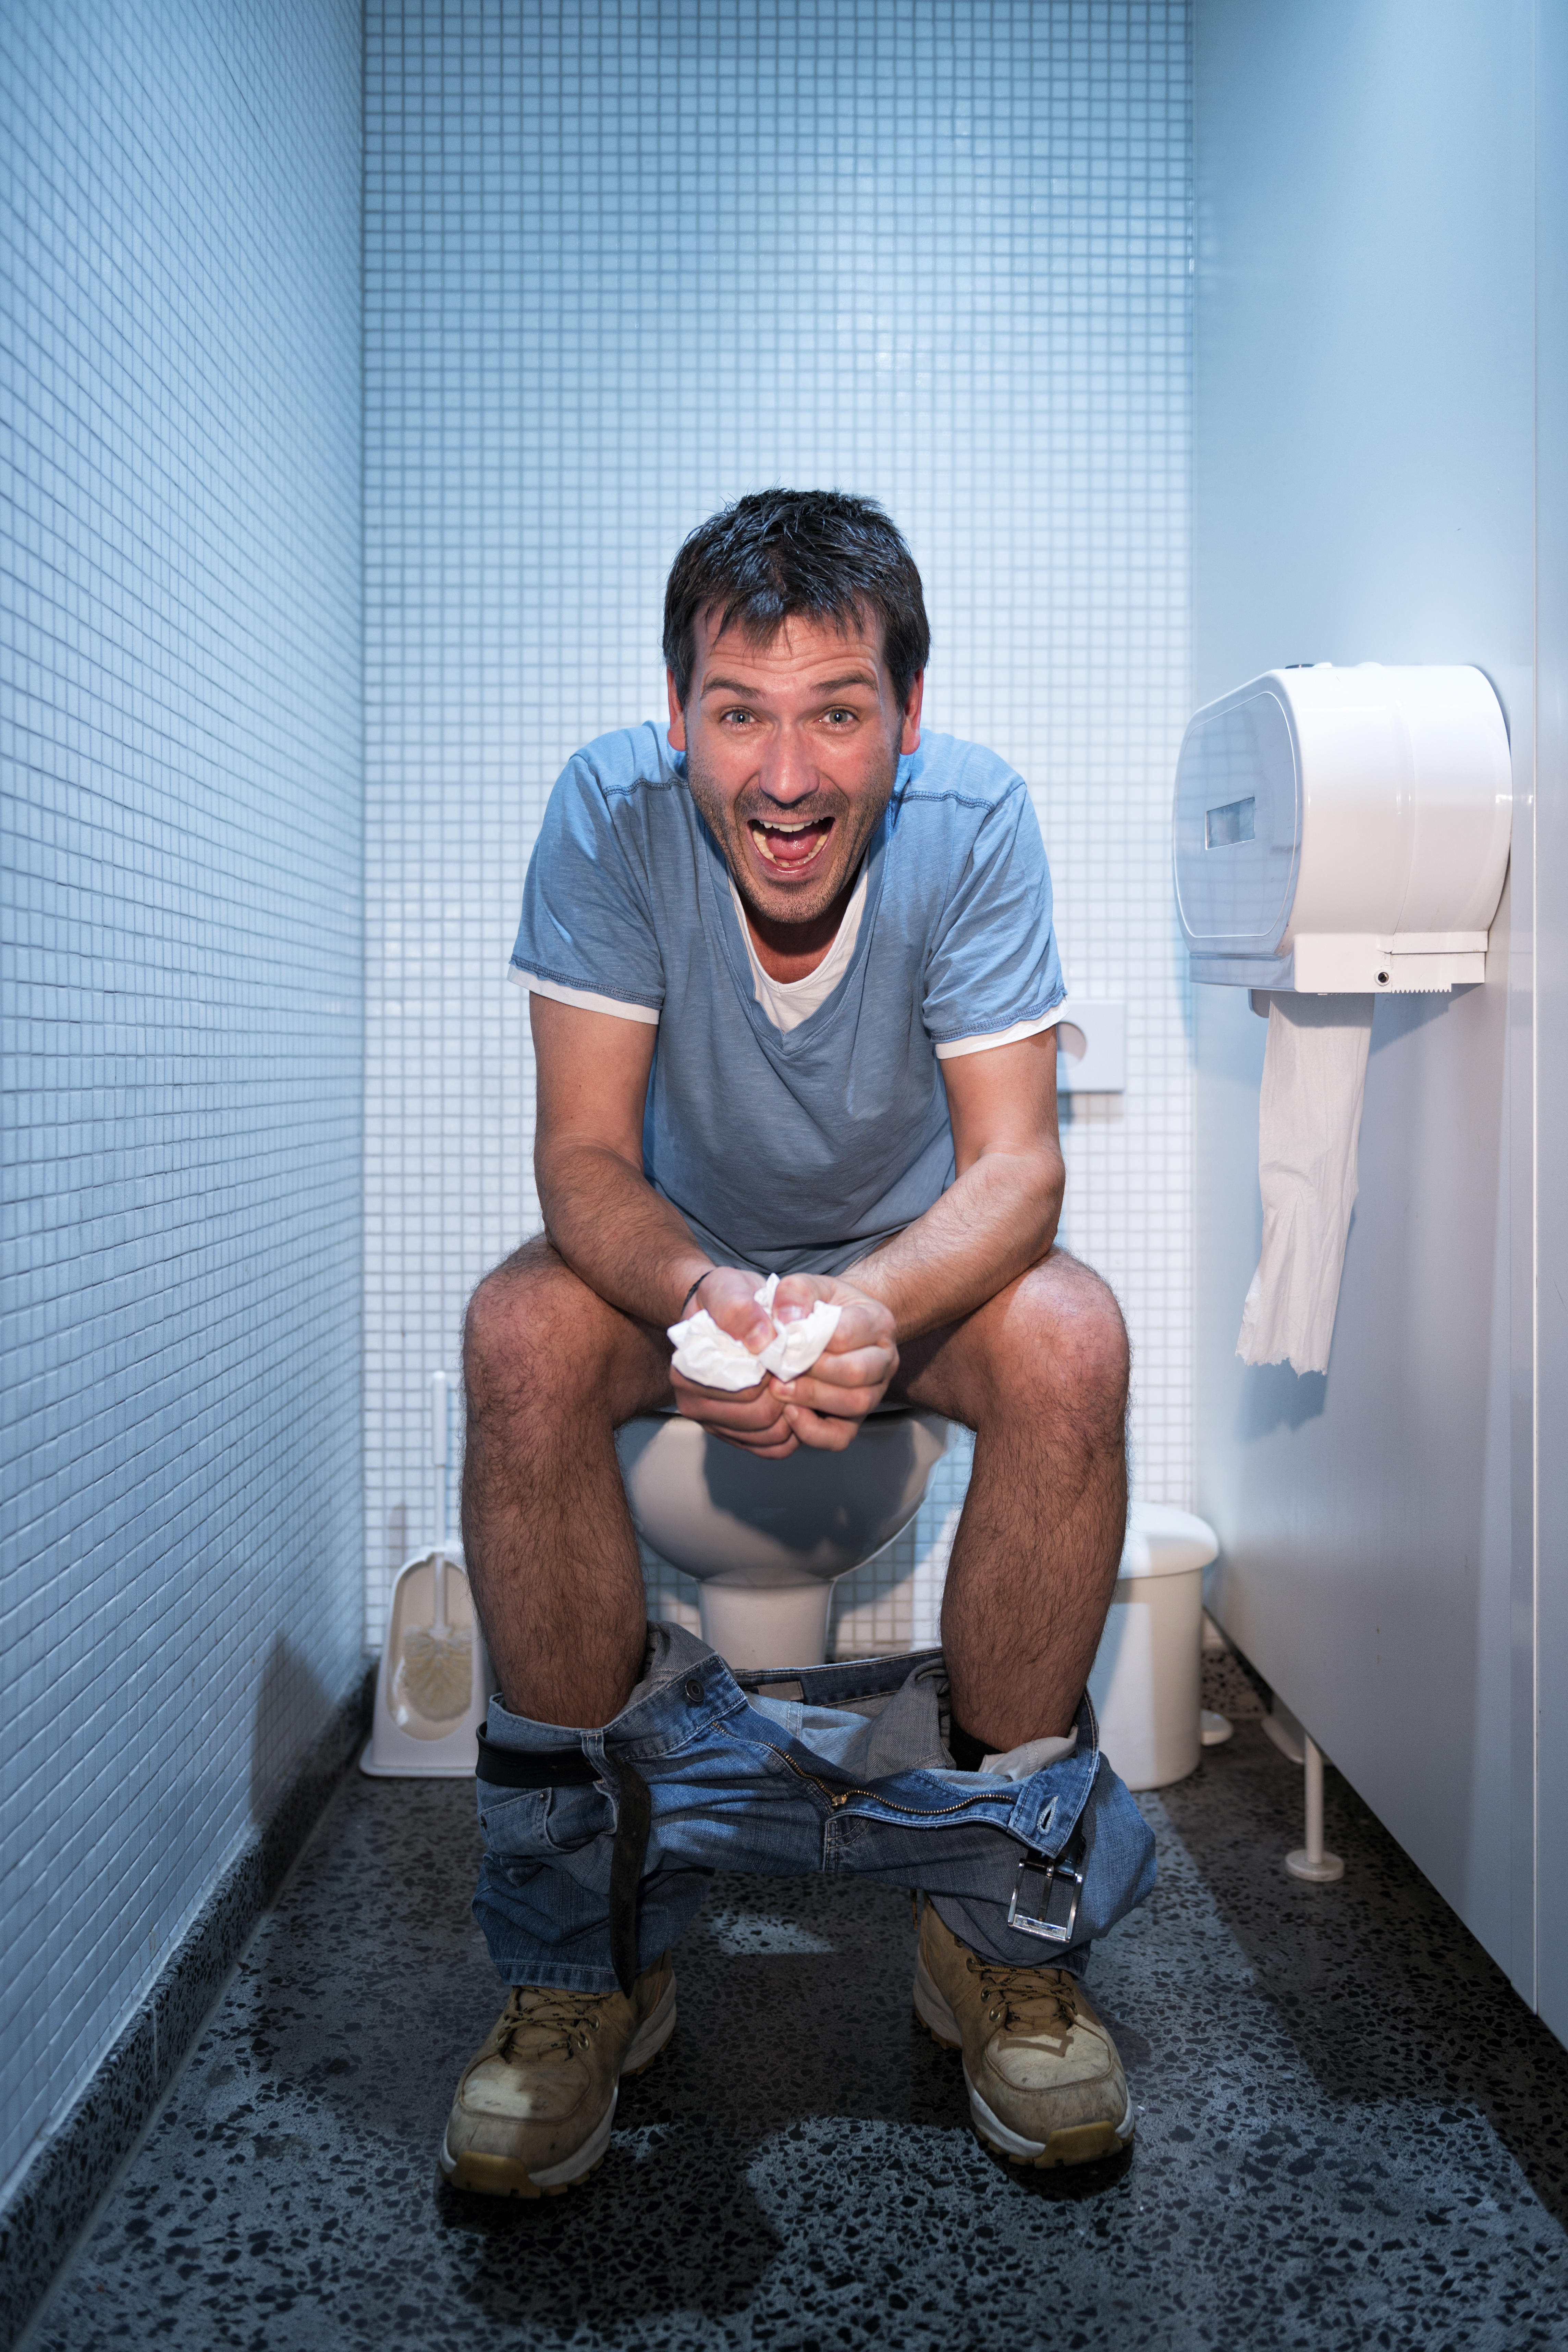 happy man sitting in public restroom